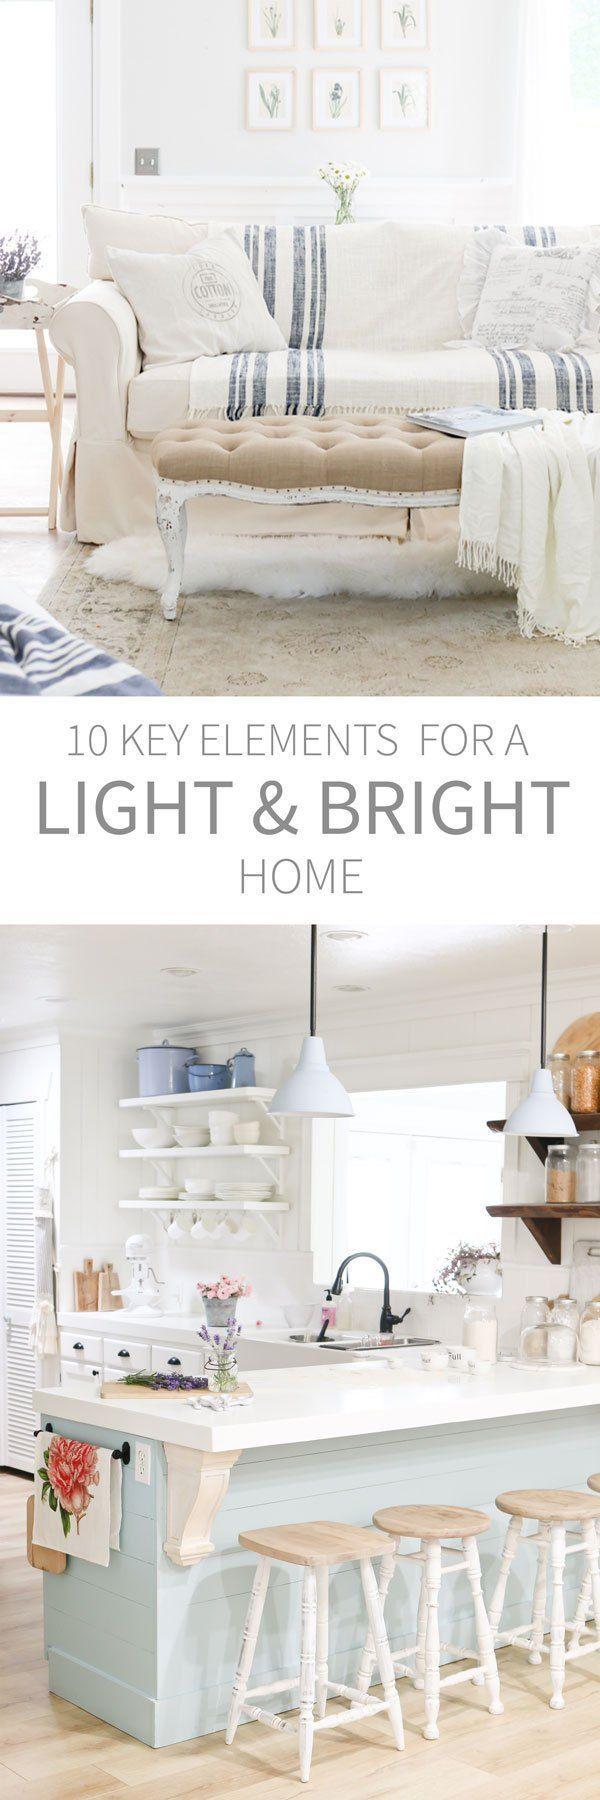 201 best Kitchen Inspiration images on Pinterest | Ad home ...